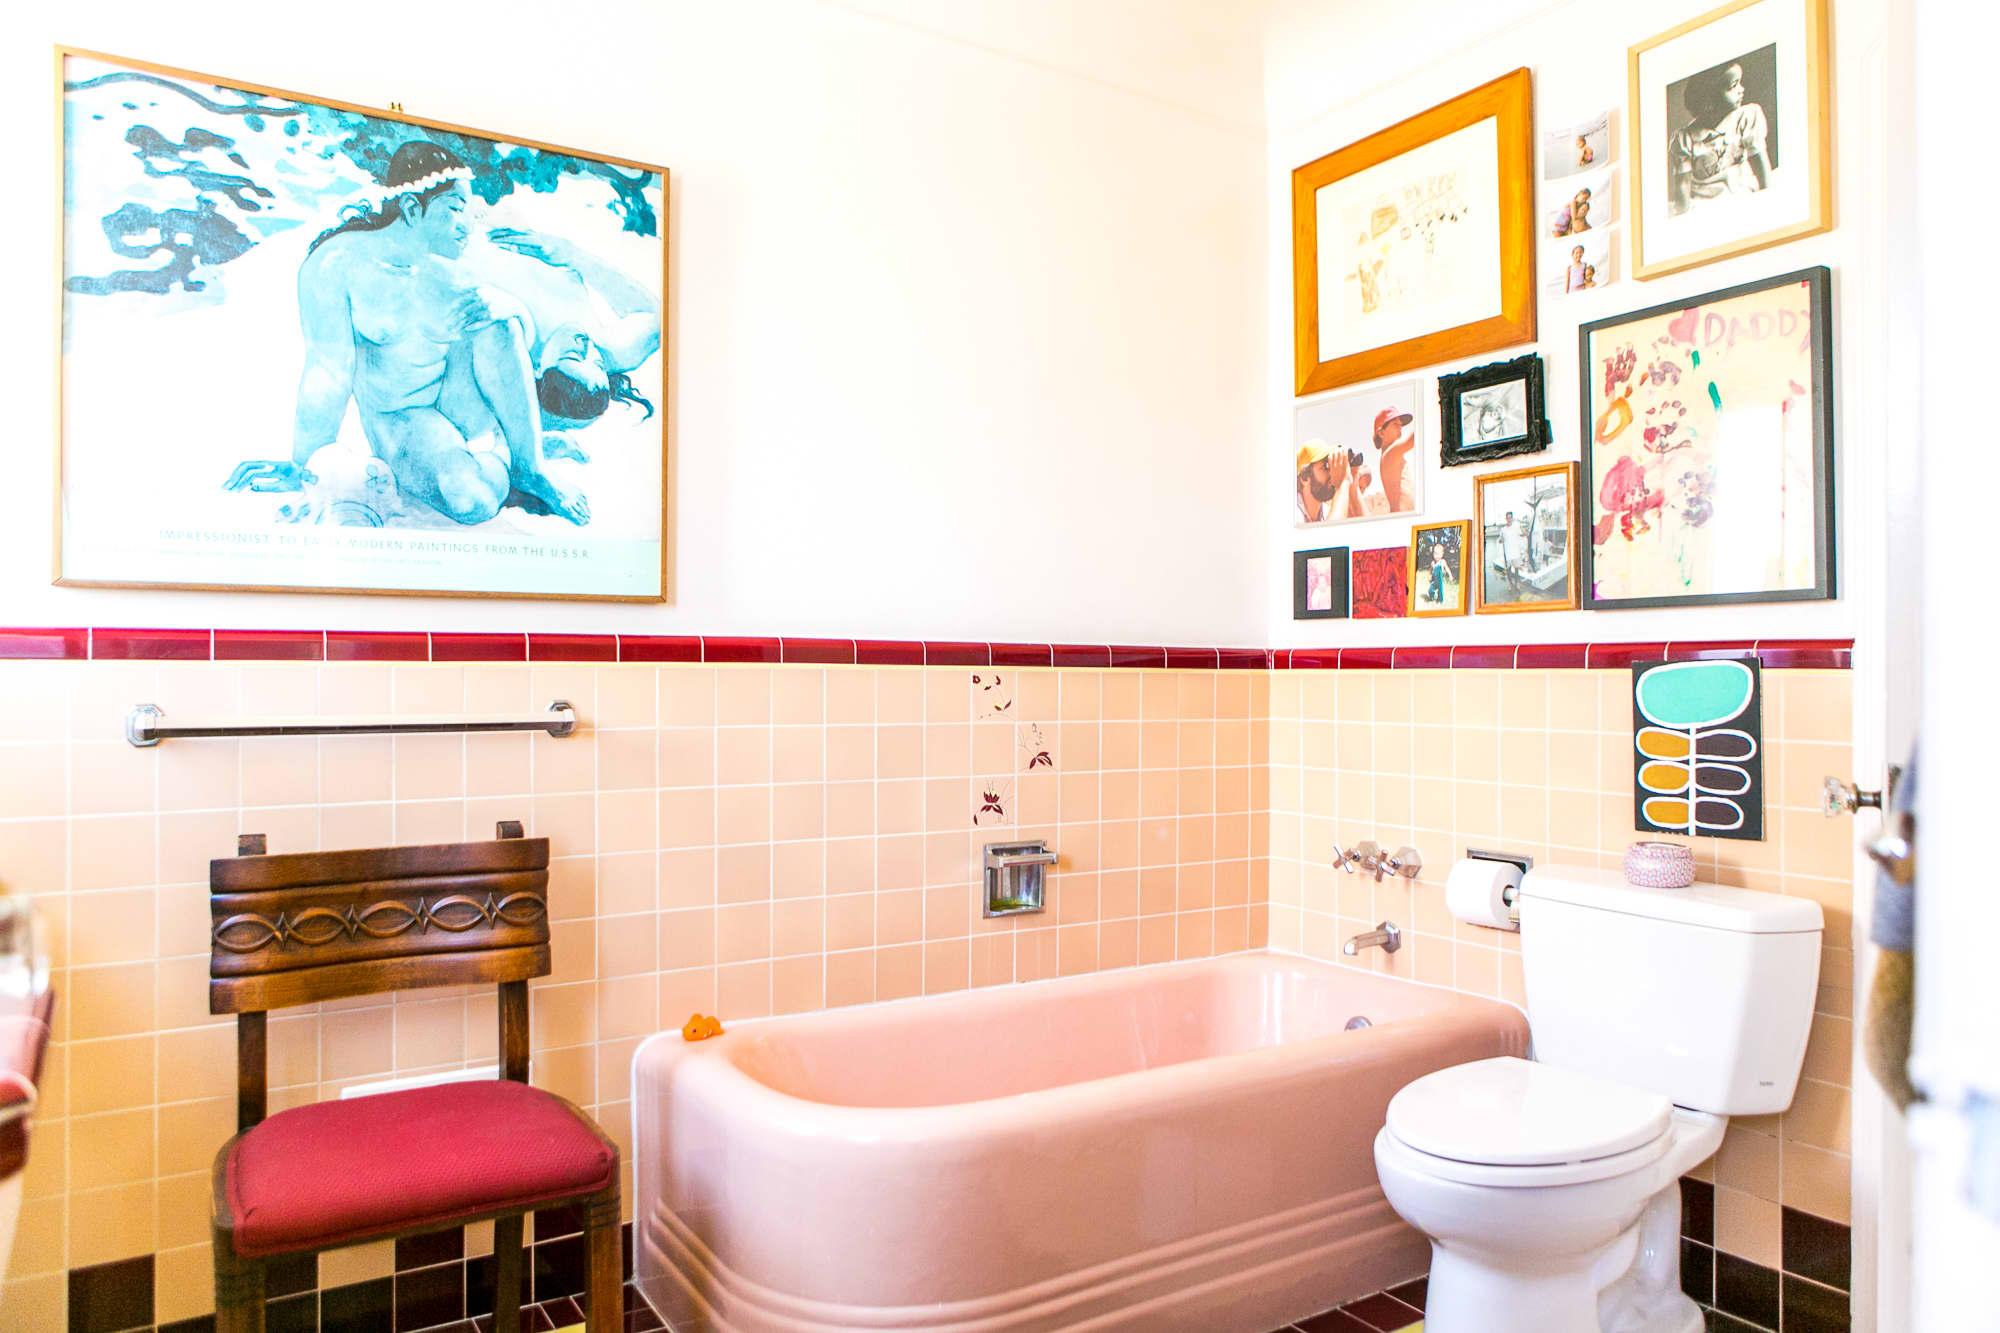 12 Retro Bathroom Ideas Cool Old Style Bathroom Photos Apartment Therapy